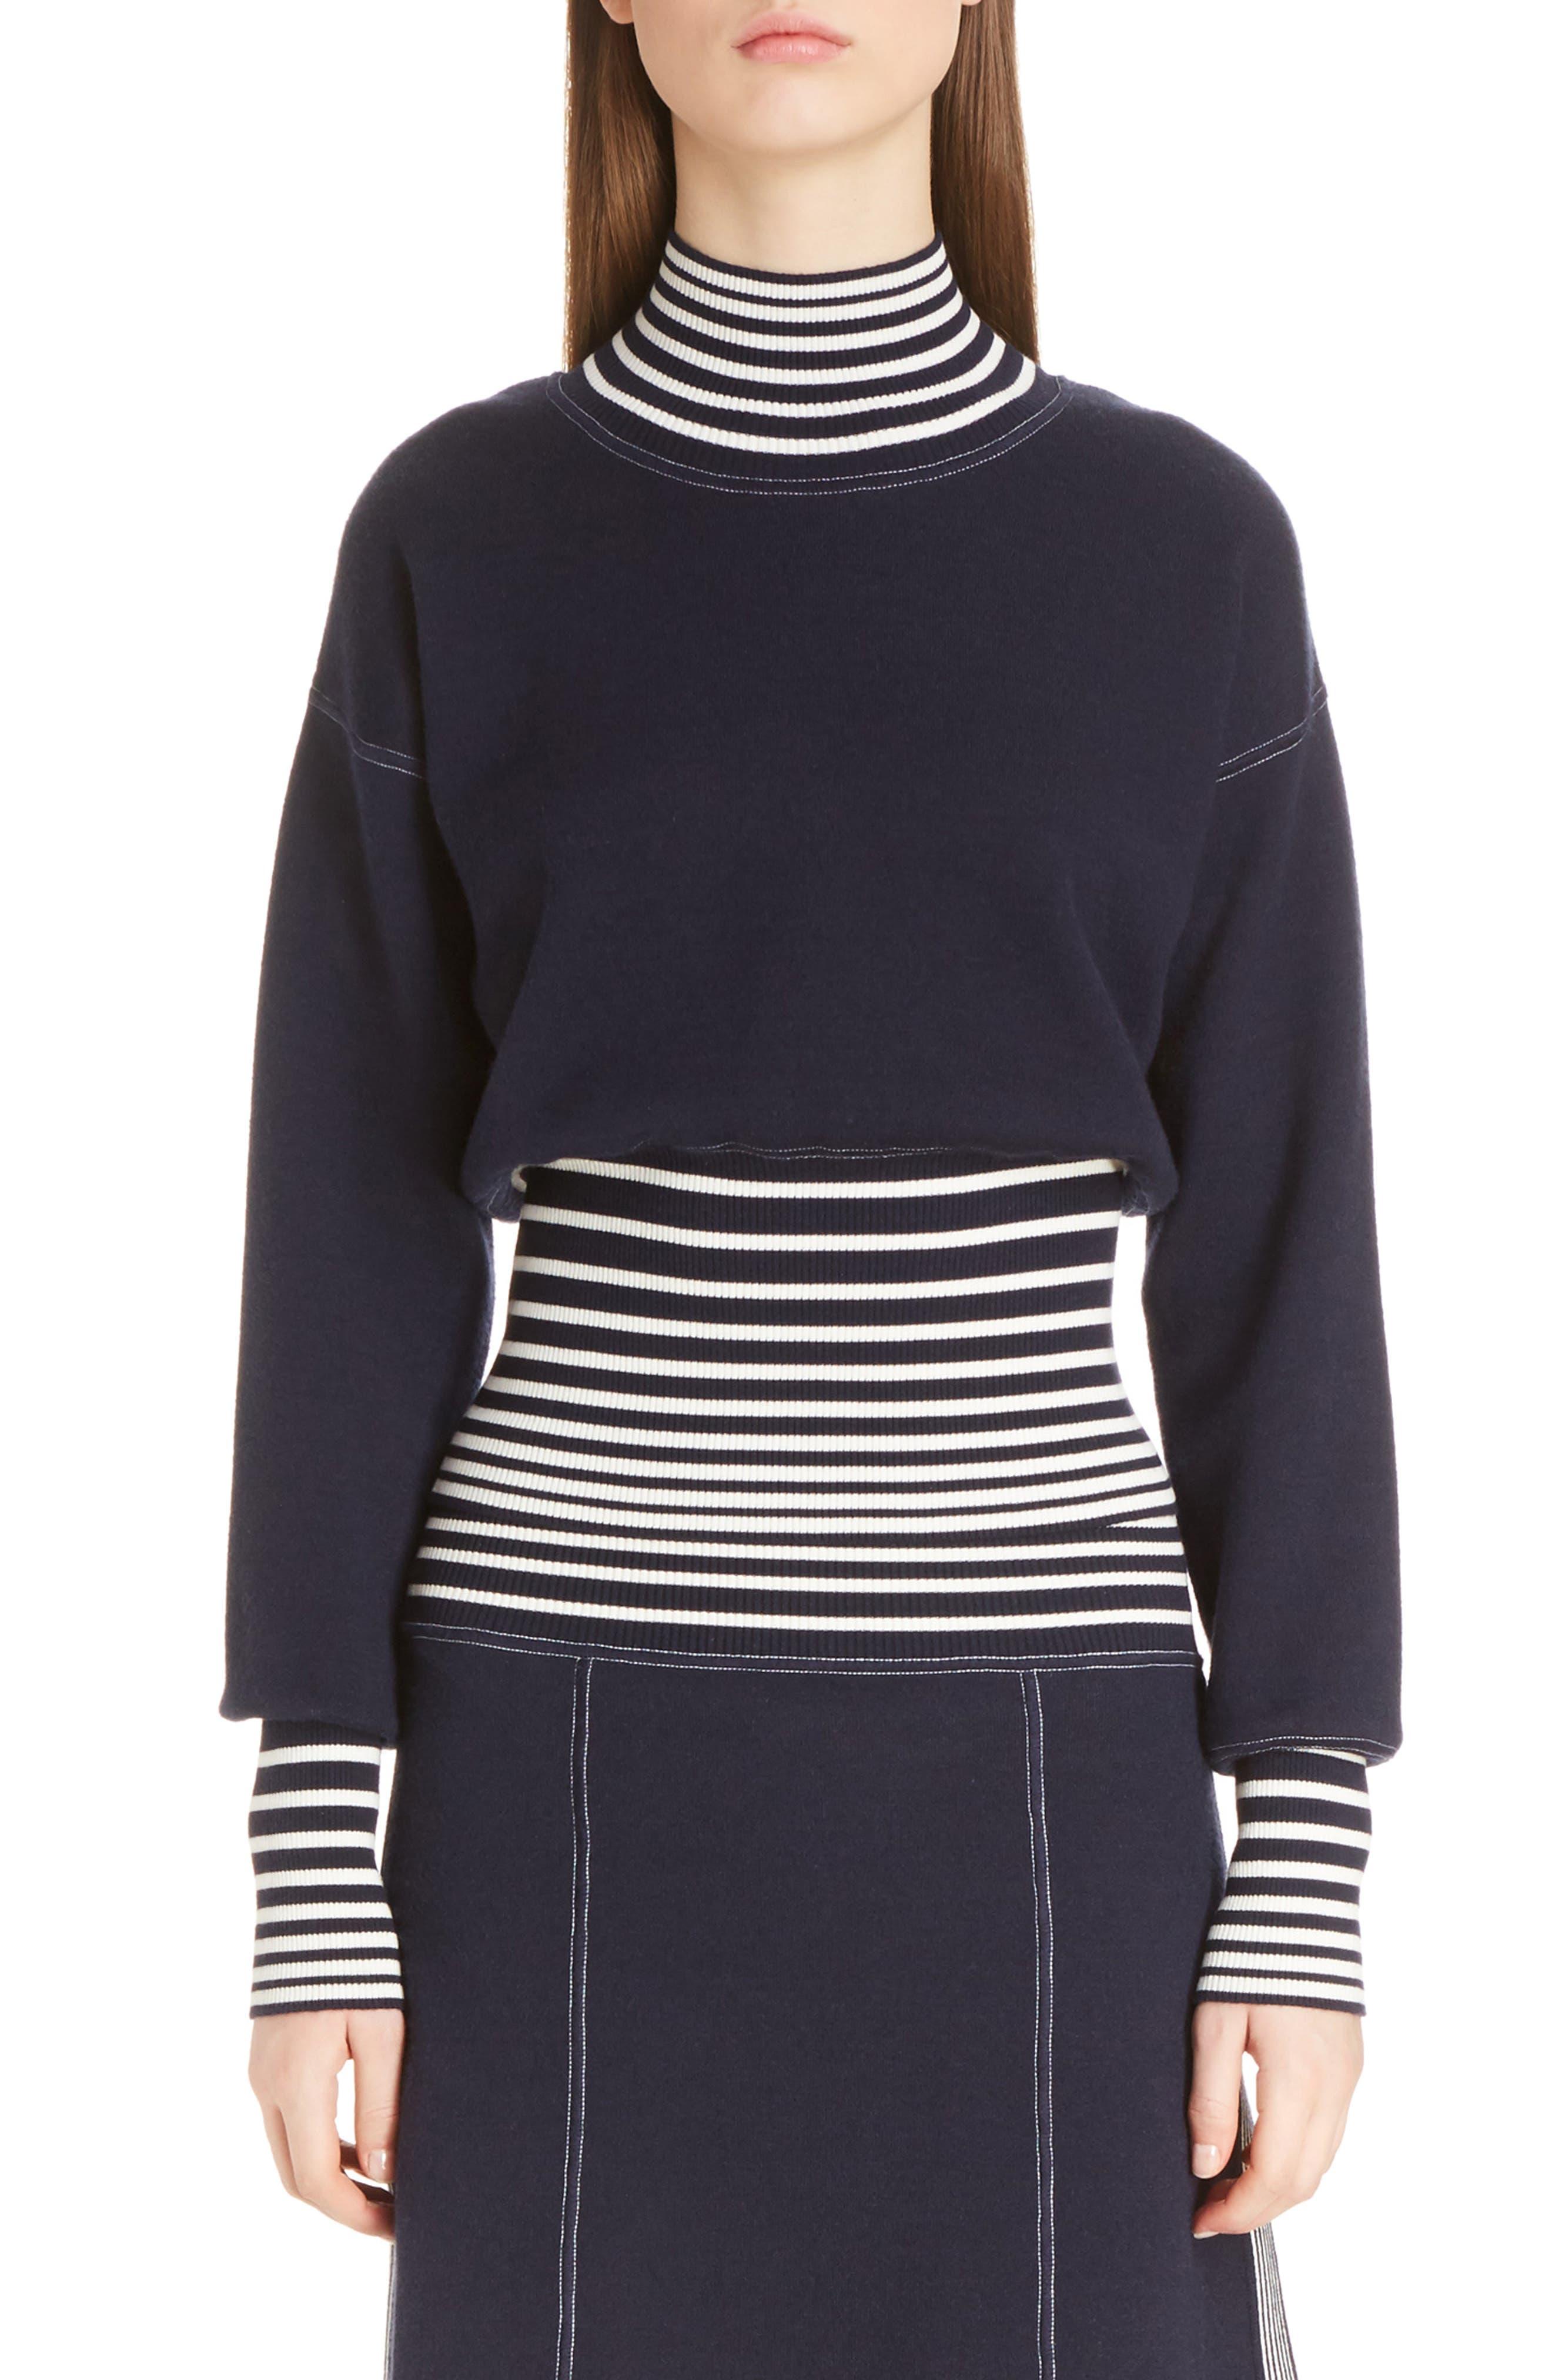 Alternate Image 1 Selected - Loewe Stripe Knit Turtleneck